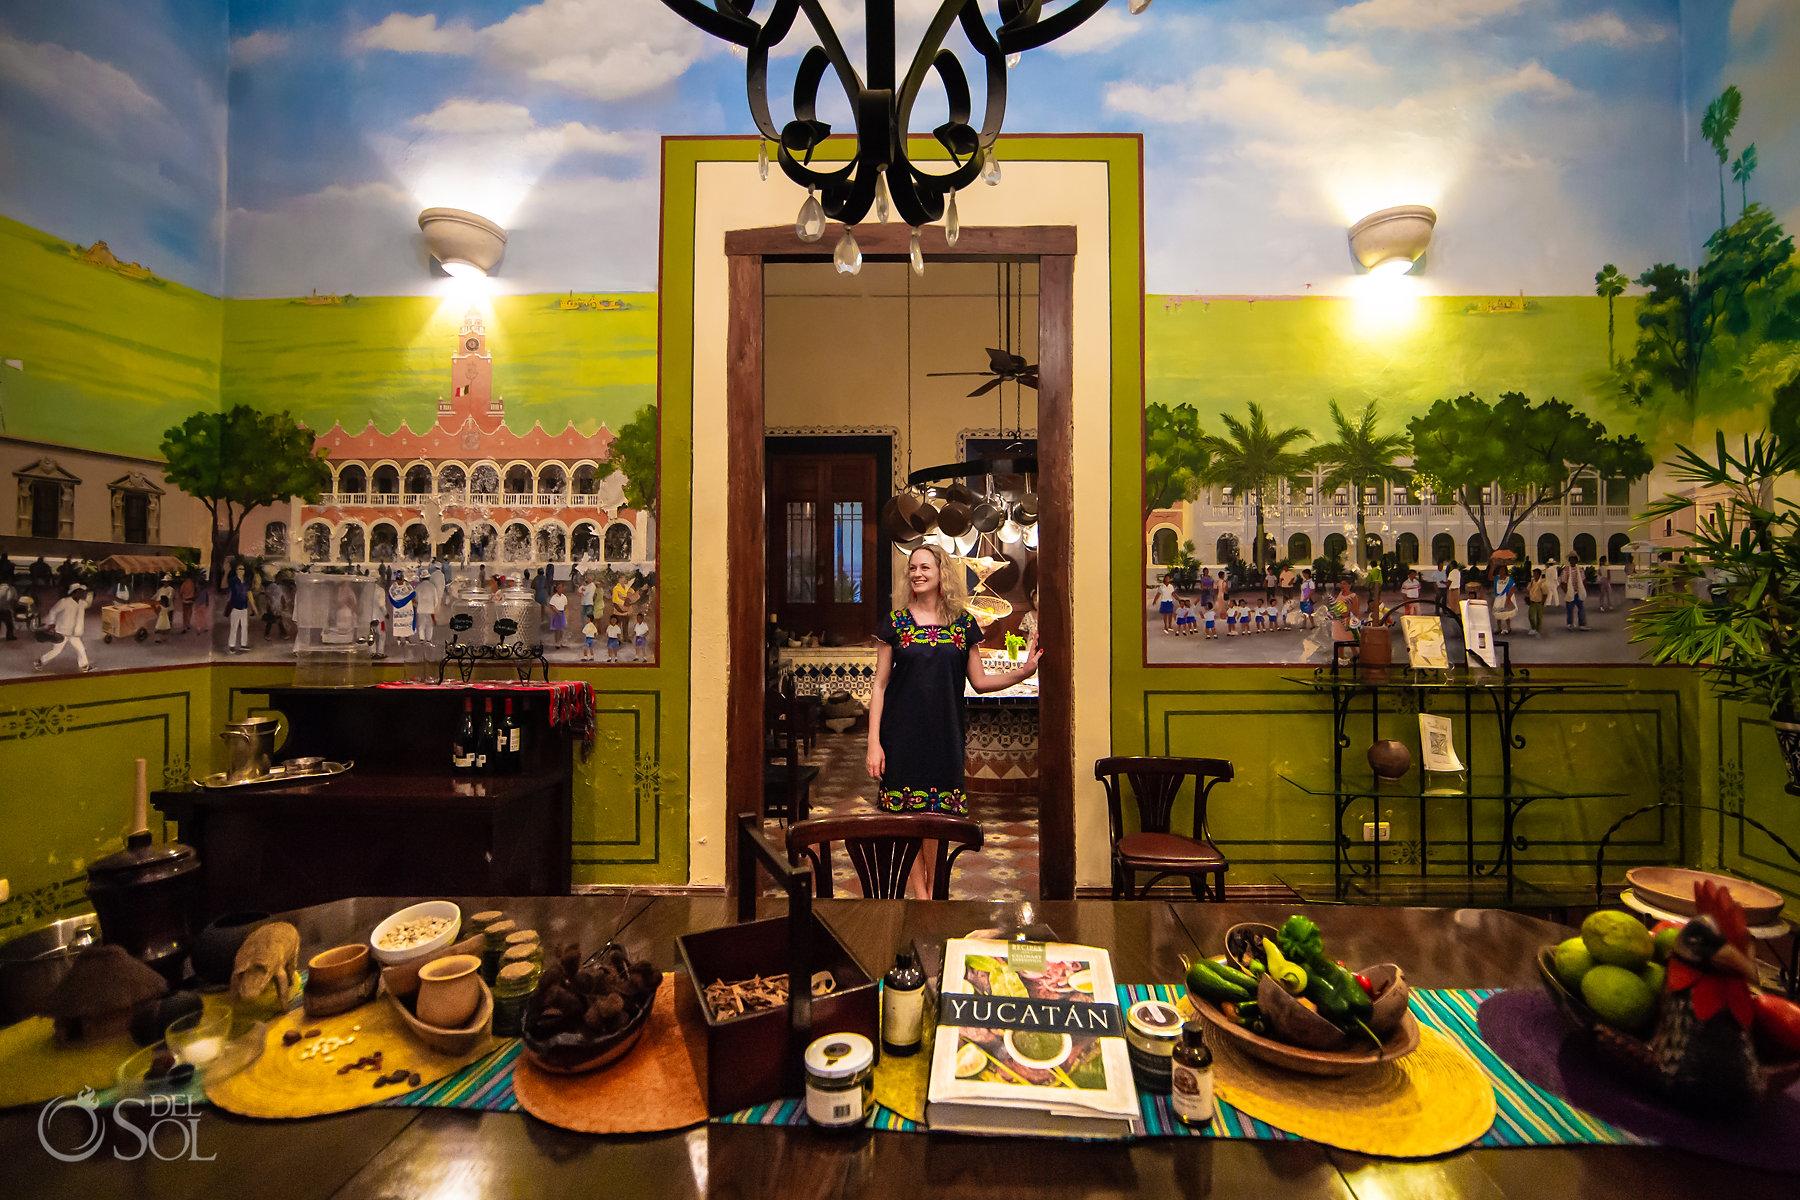 Yucatan trip Birthday ideas